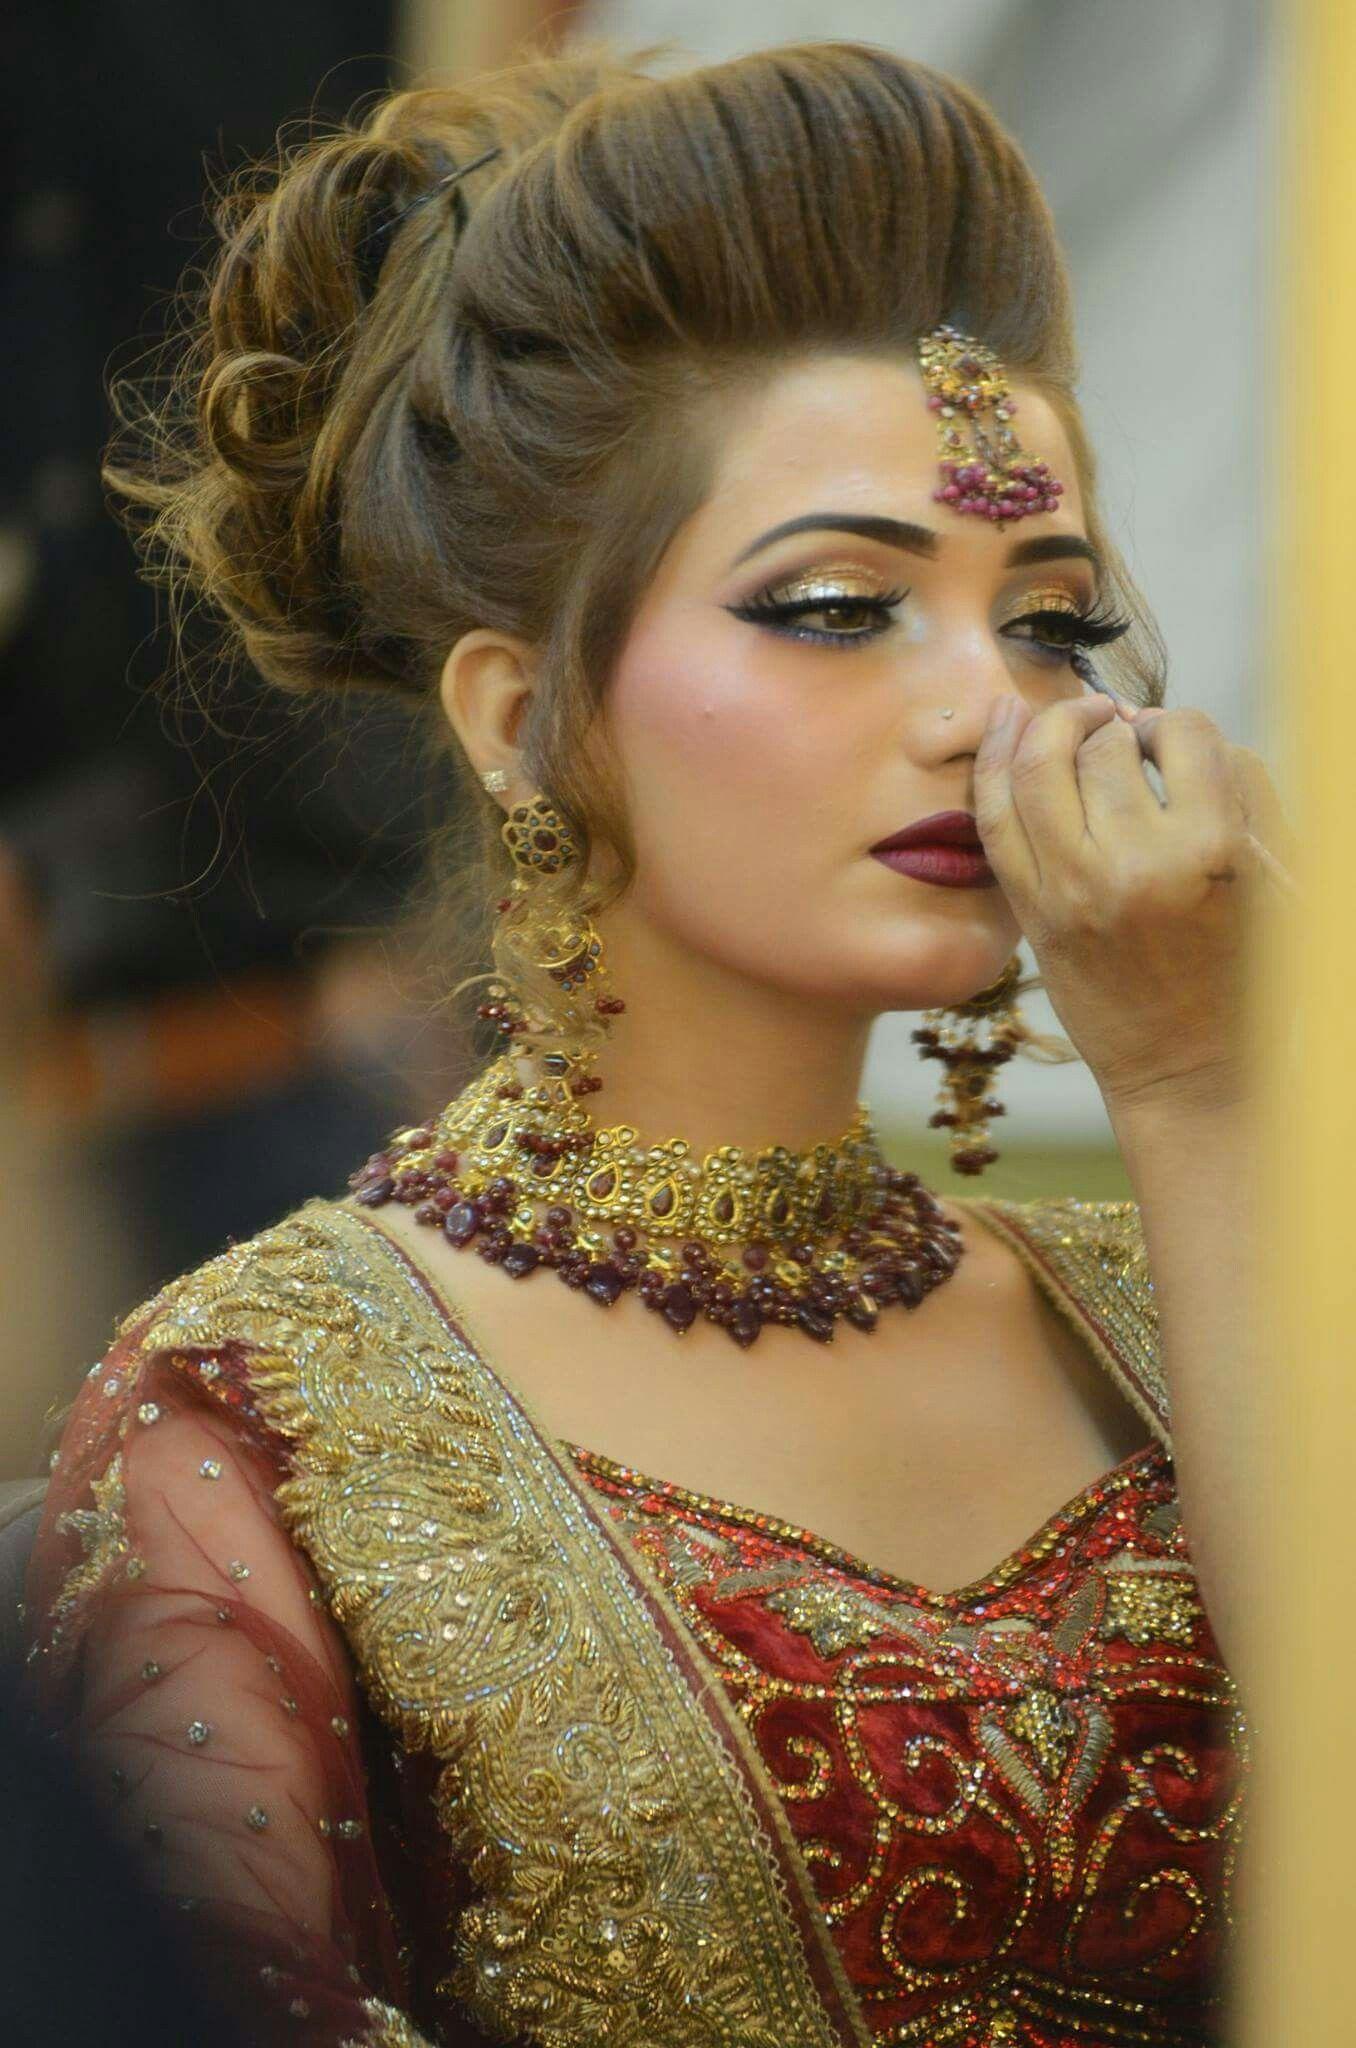 Pin By R E Creation On Gallery Bridal Hair Buns Bridal Hairstyle Indian Wedding Pakistani Bridal Makeup